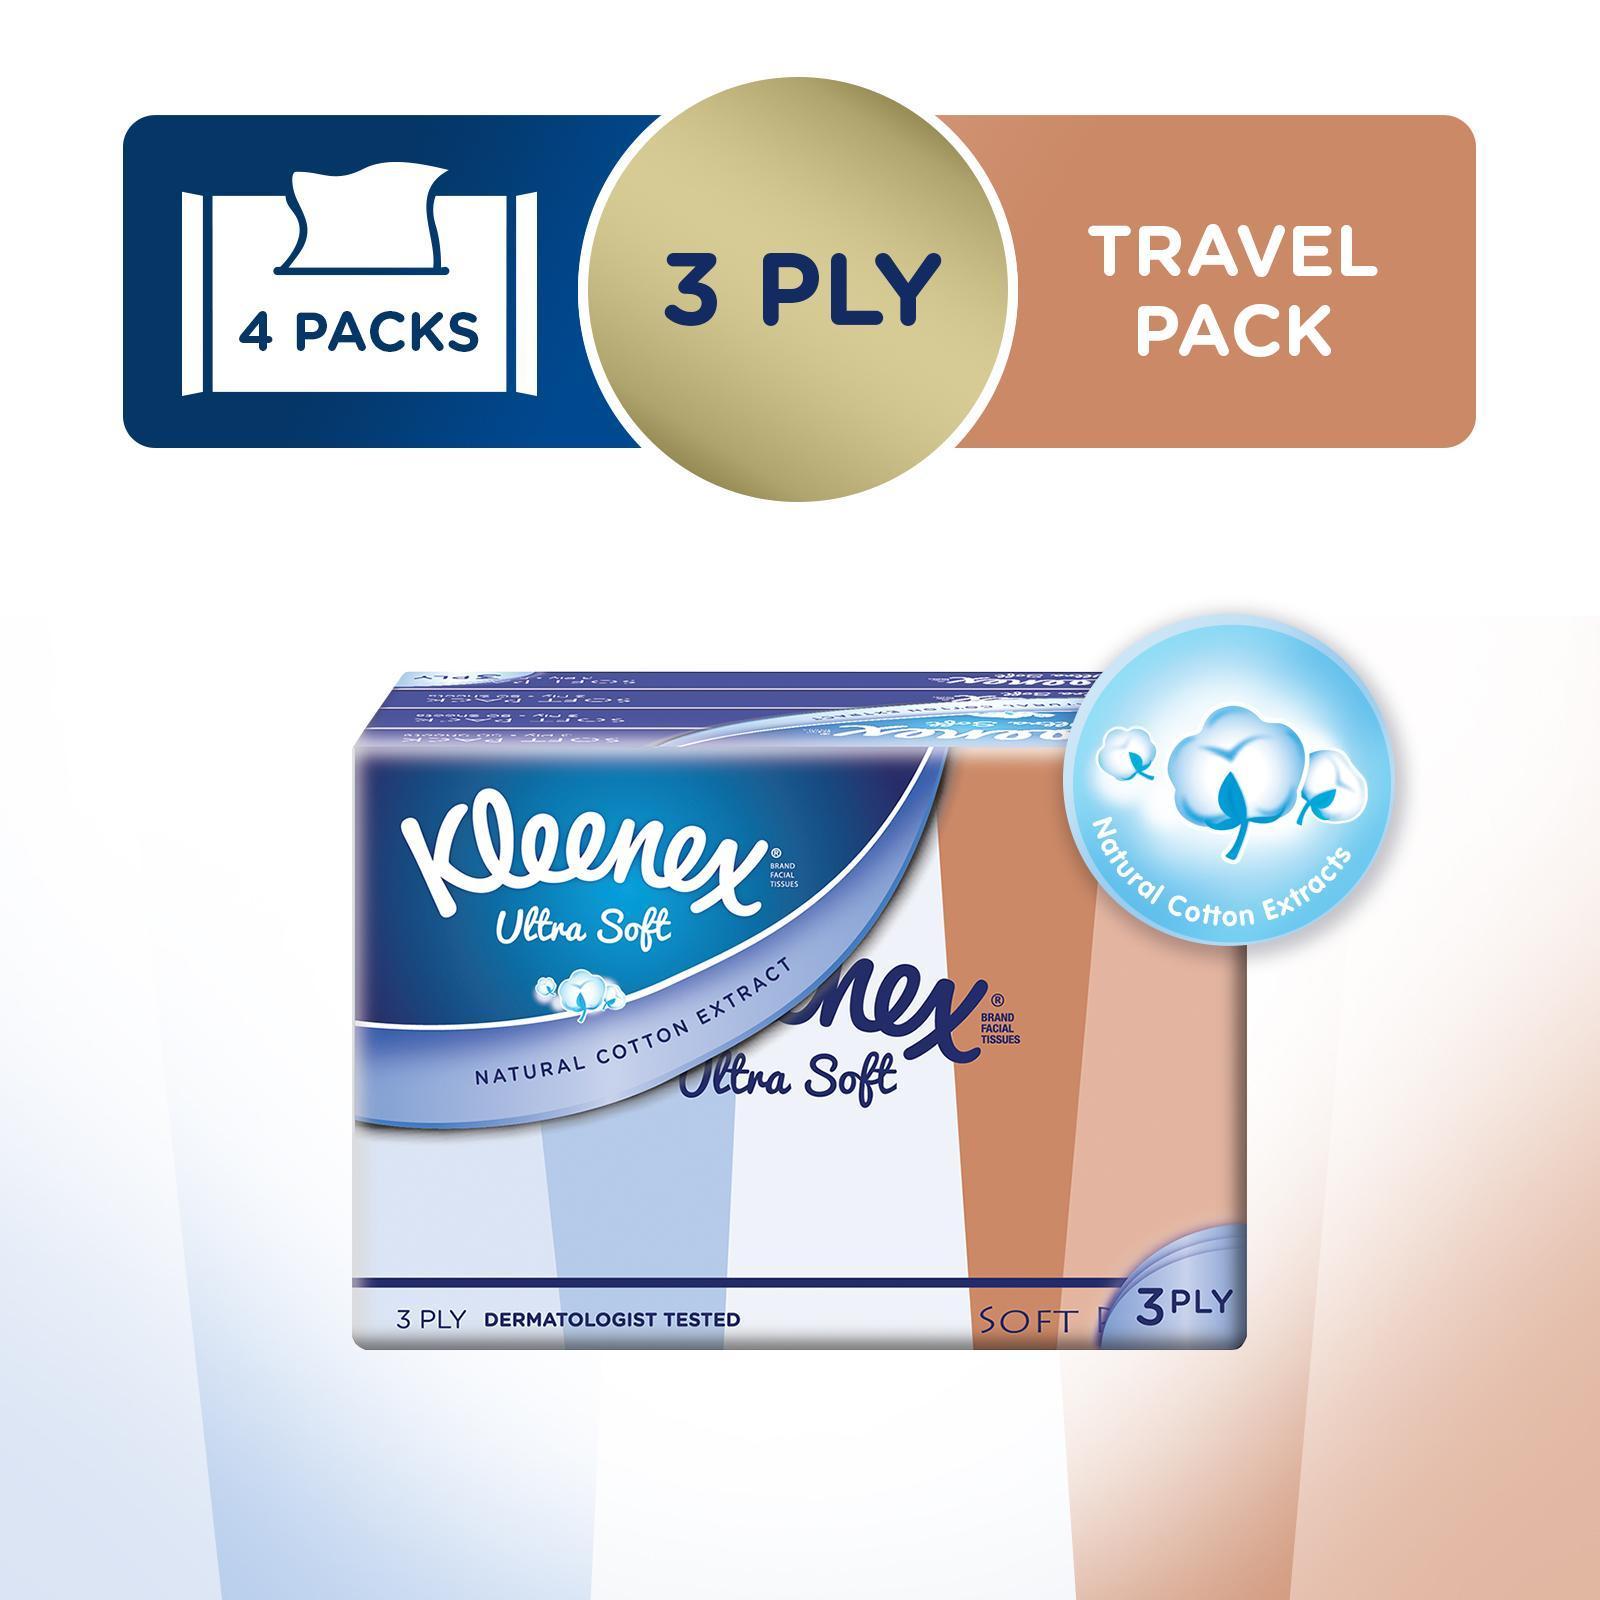 Kleenex UltraSoft3-PlyTissuesLifestyleSoftPack(PackagingDesignMayVary)